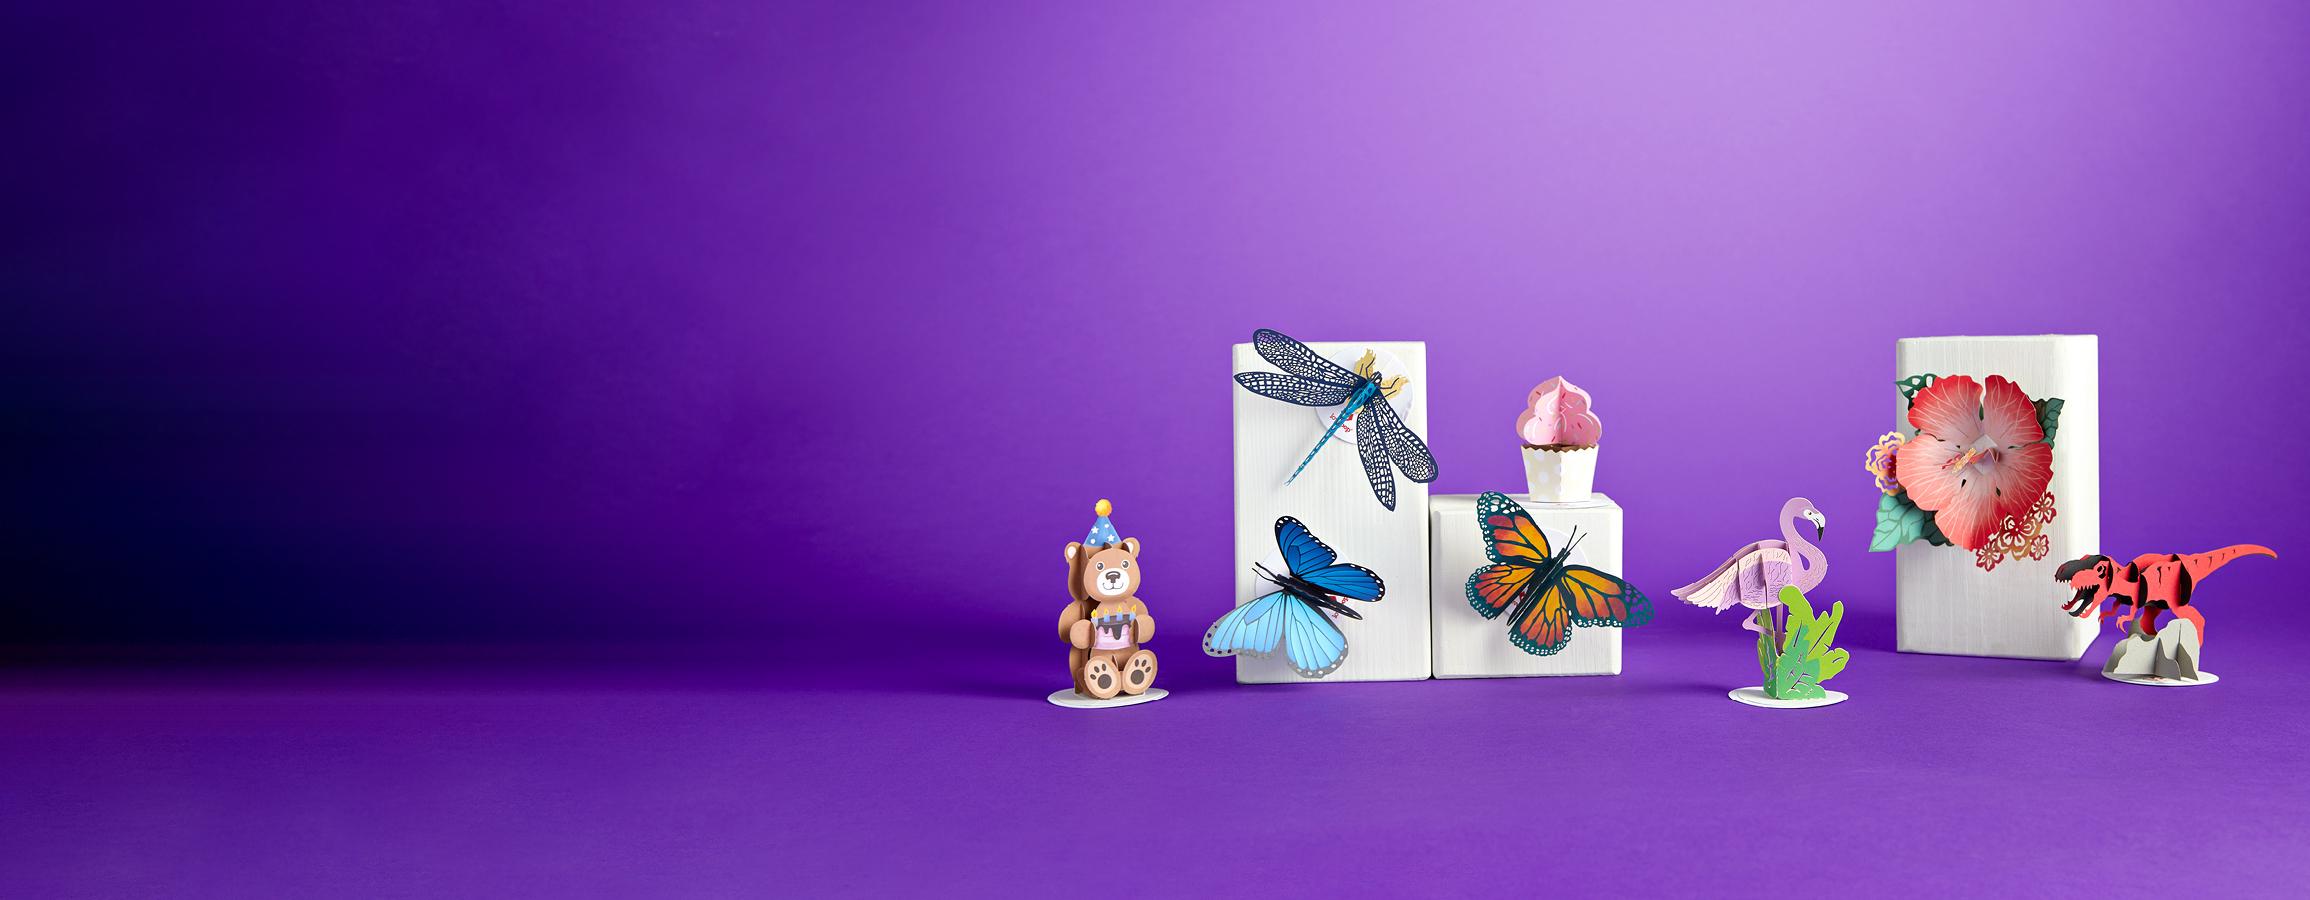 lovepop-stickerpop-3d-stickers